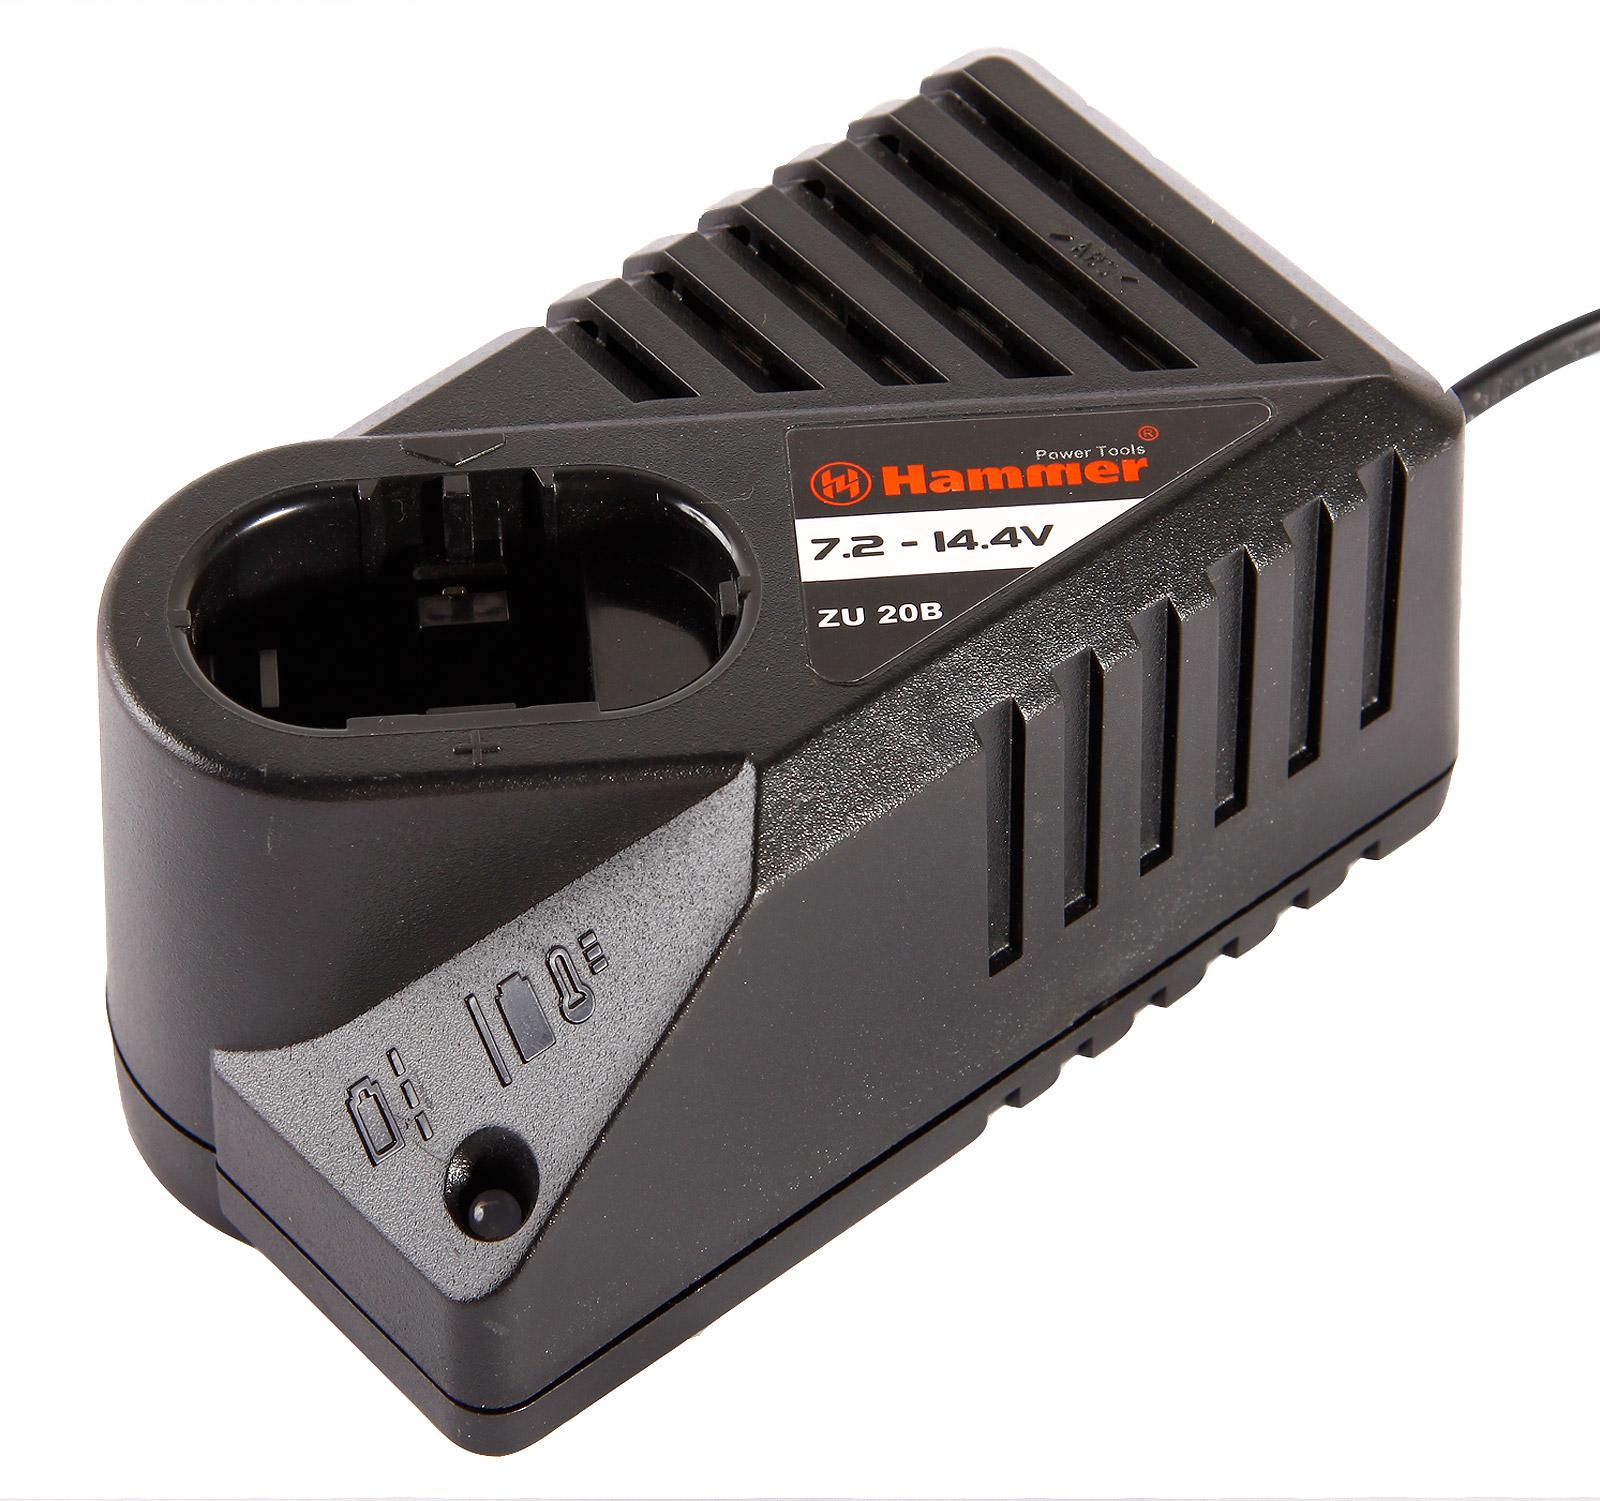 Фото 2/2 Zu 20b для аккумуляторов bosch, Зарядное устройство